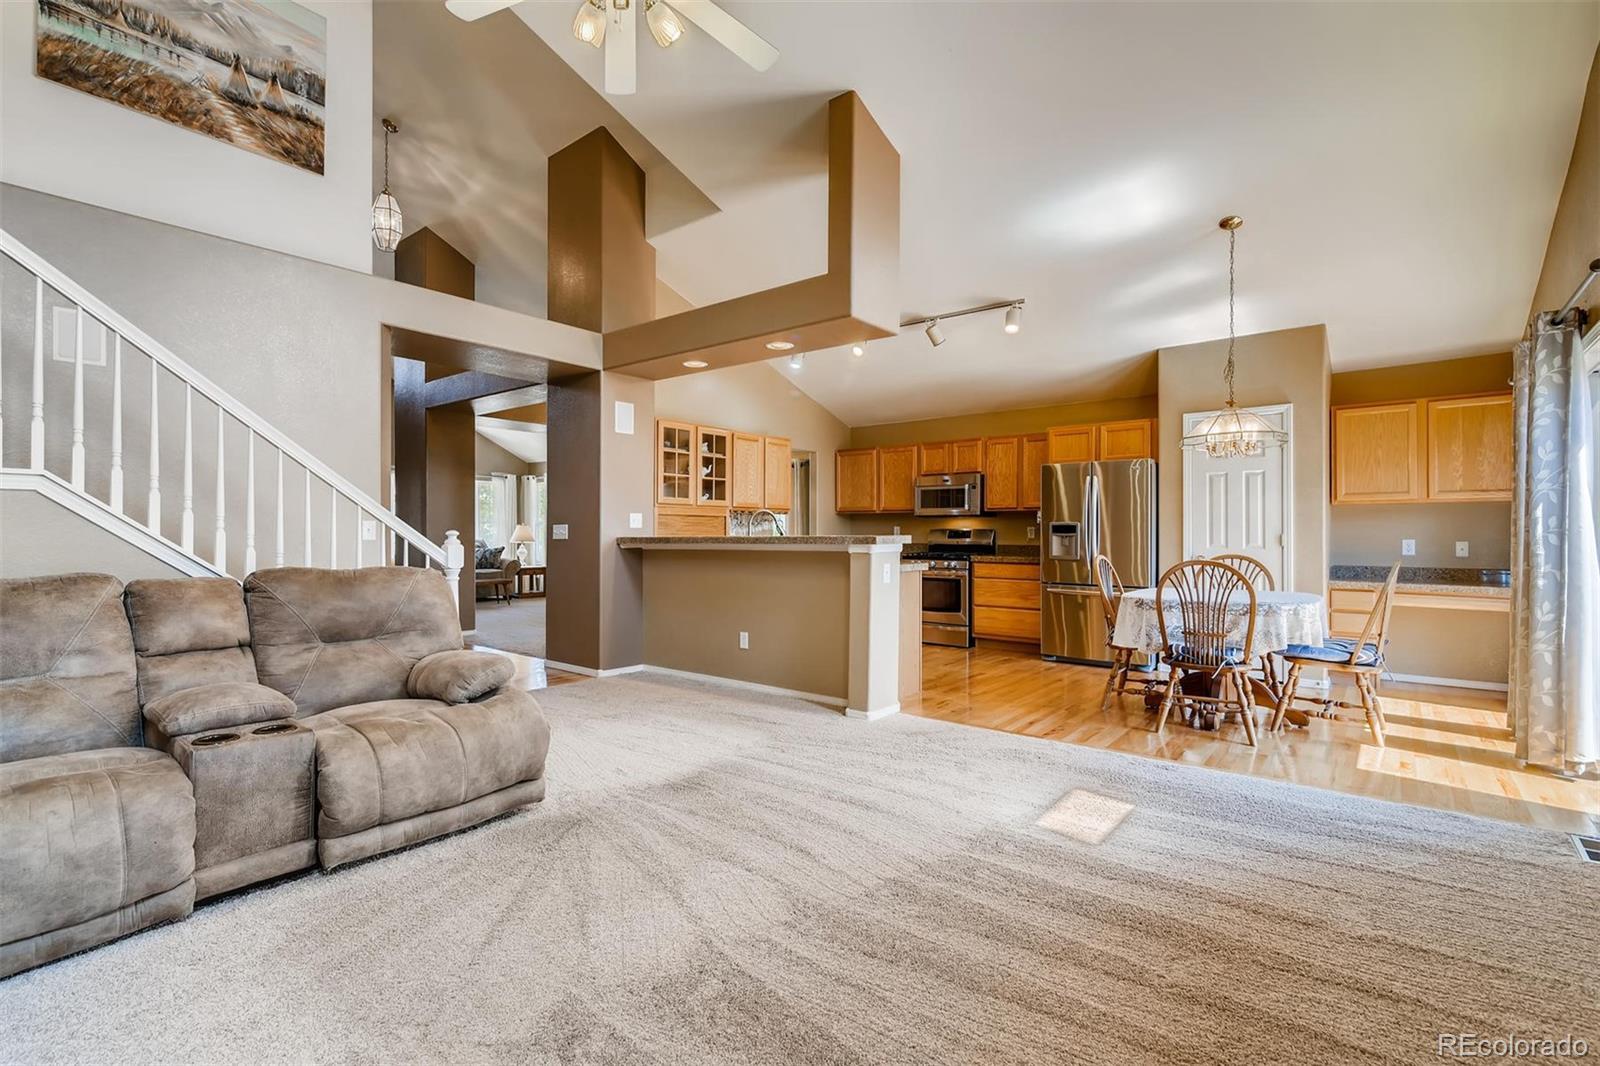 MLS# 9724731 - 16 - 498 Promontory Drive, Loveland, CO 80537